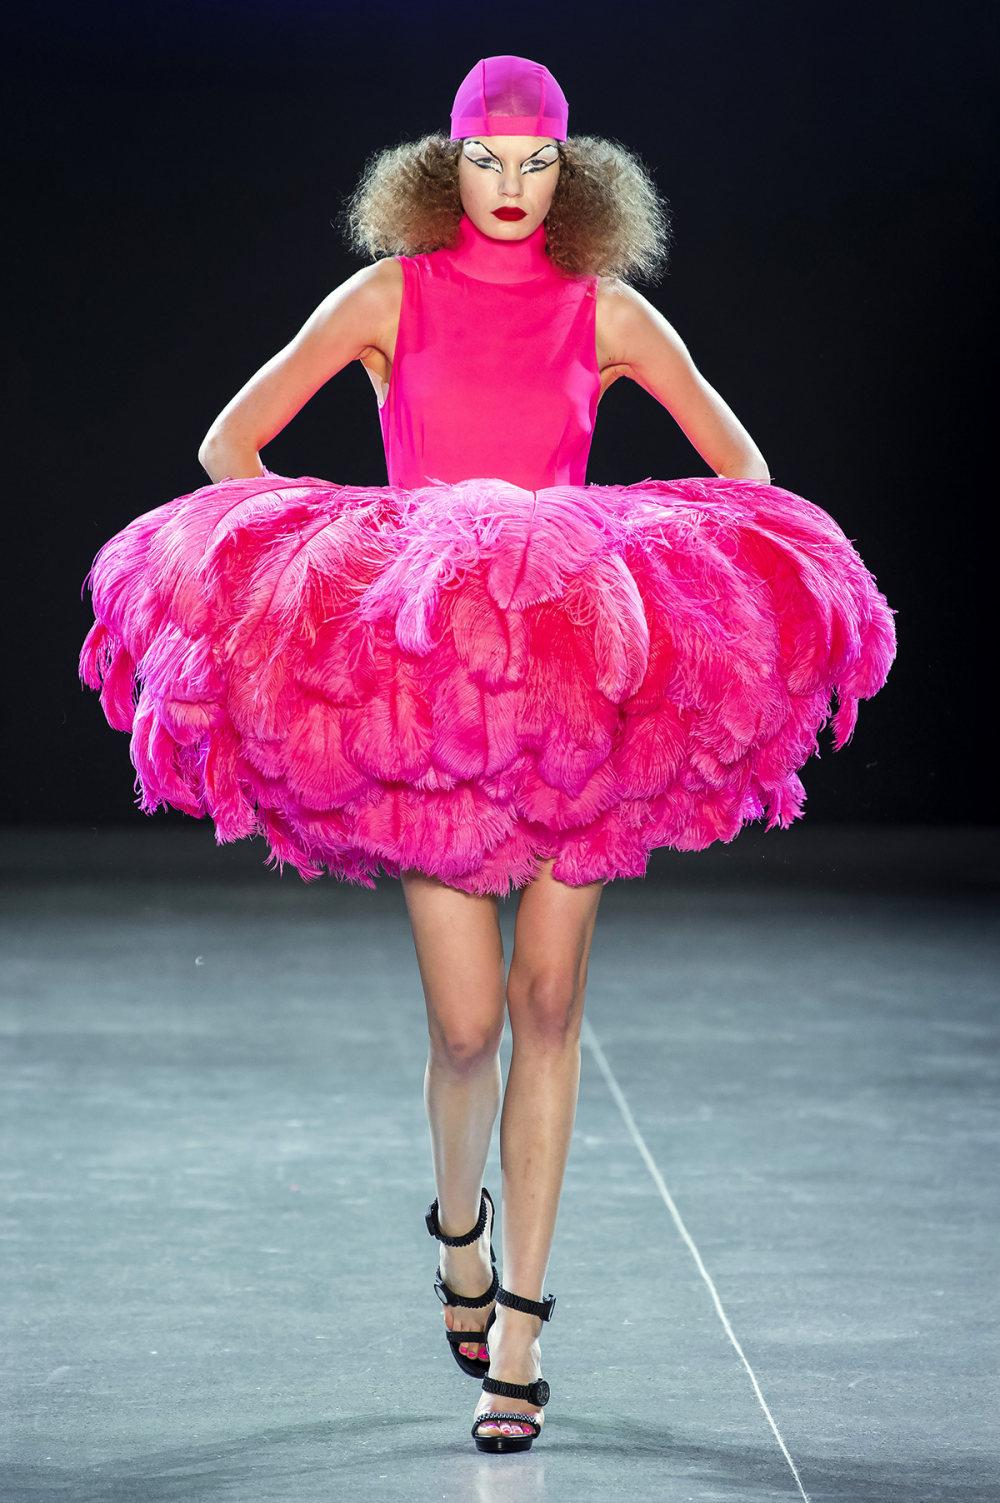 Christian Cowan时装系列虽然巨大的薄纱层状服装并没有那么特别-1.jpg